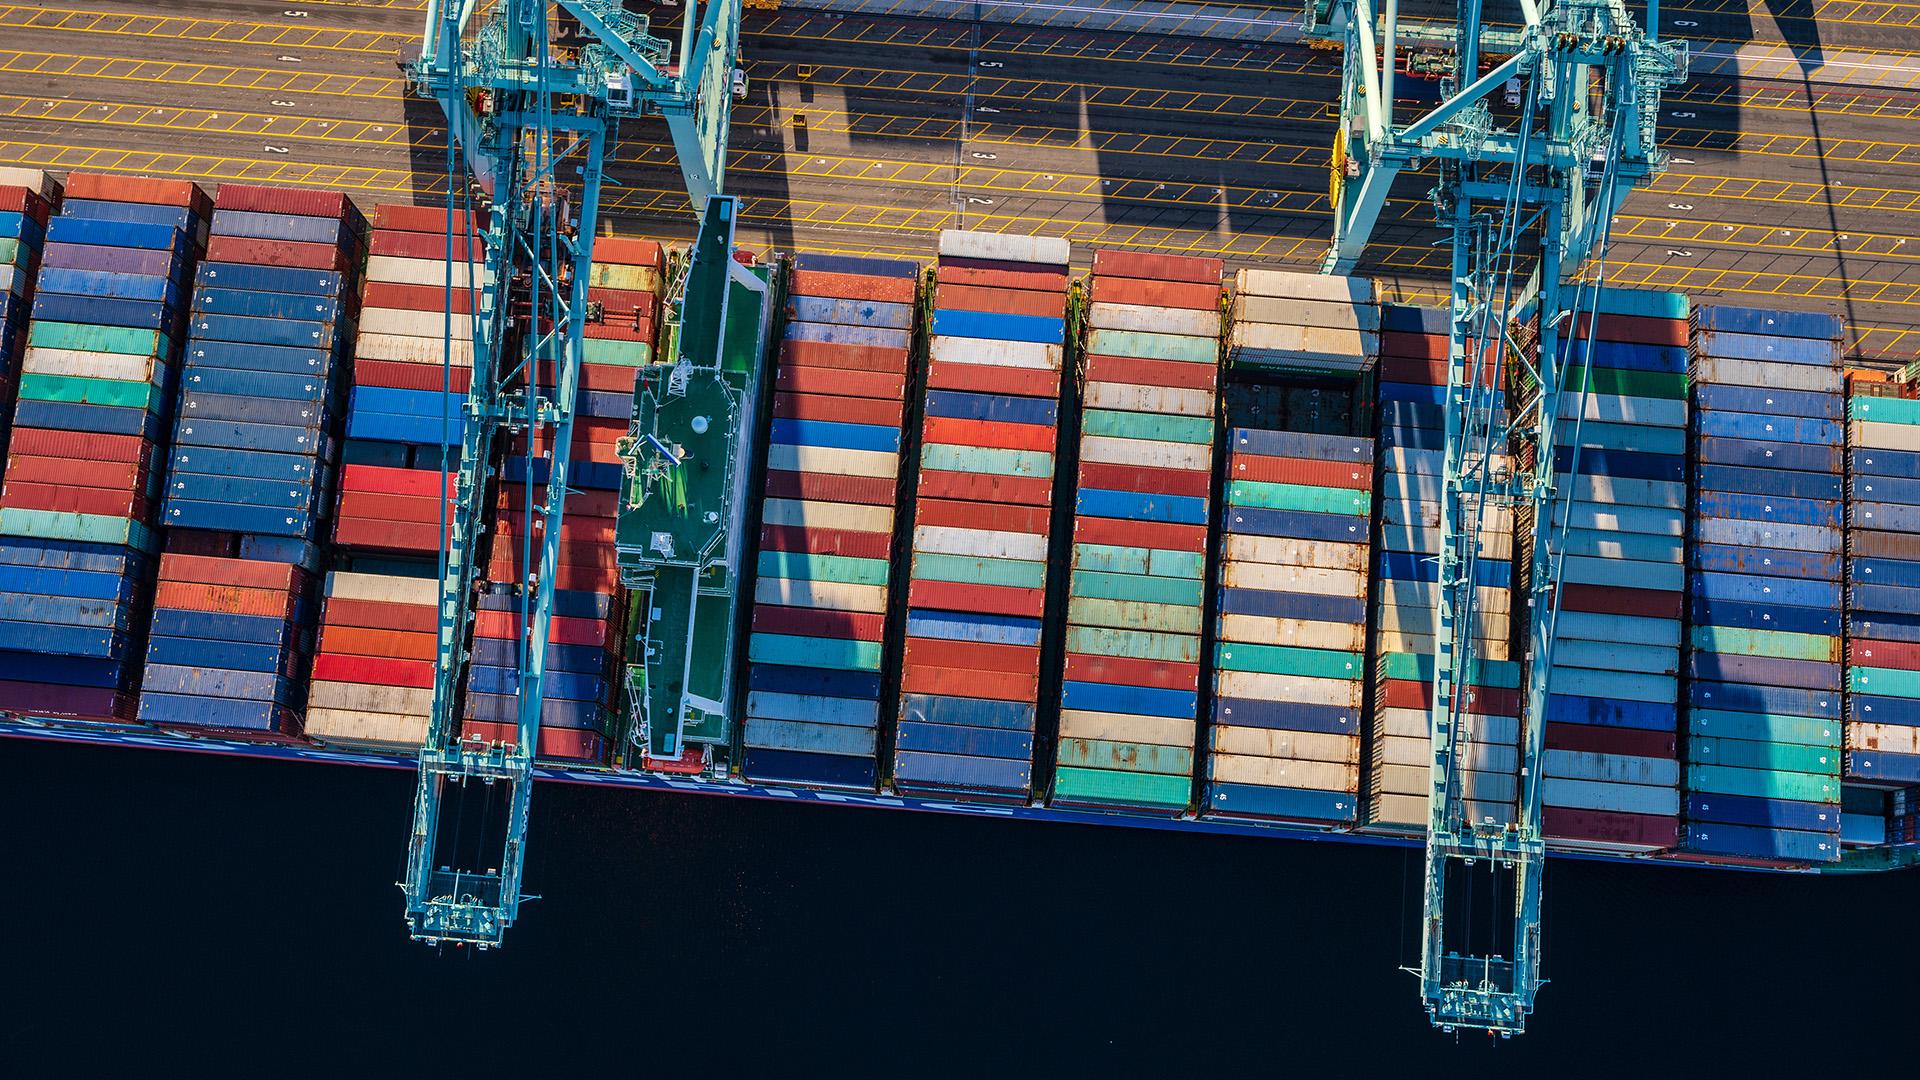 Cranes and Cargo